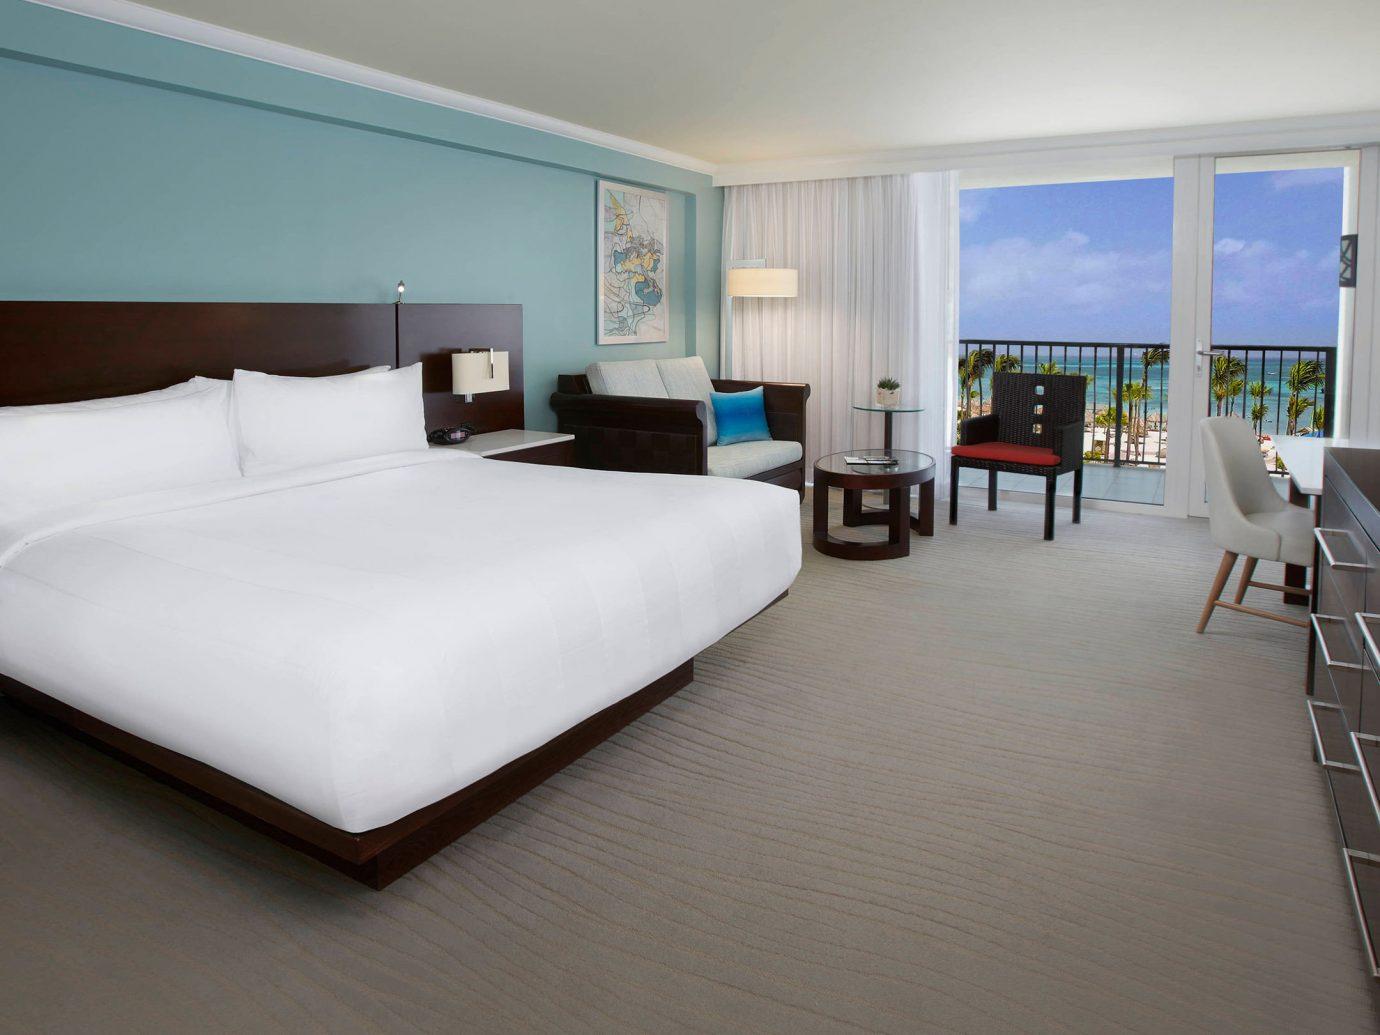 Aruba caribbean Hotels indoor floor wall room ceiling bed Suite hotel real estate furniture interior design Bedroom flooring